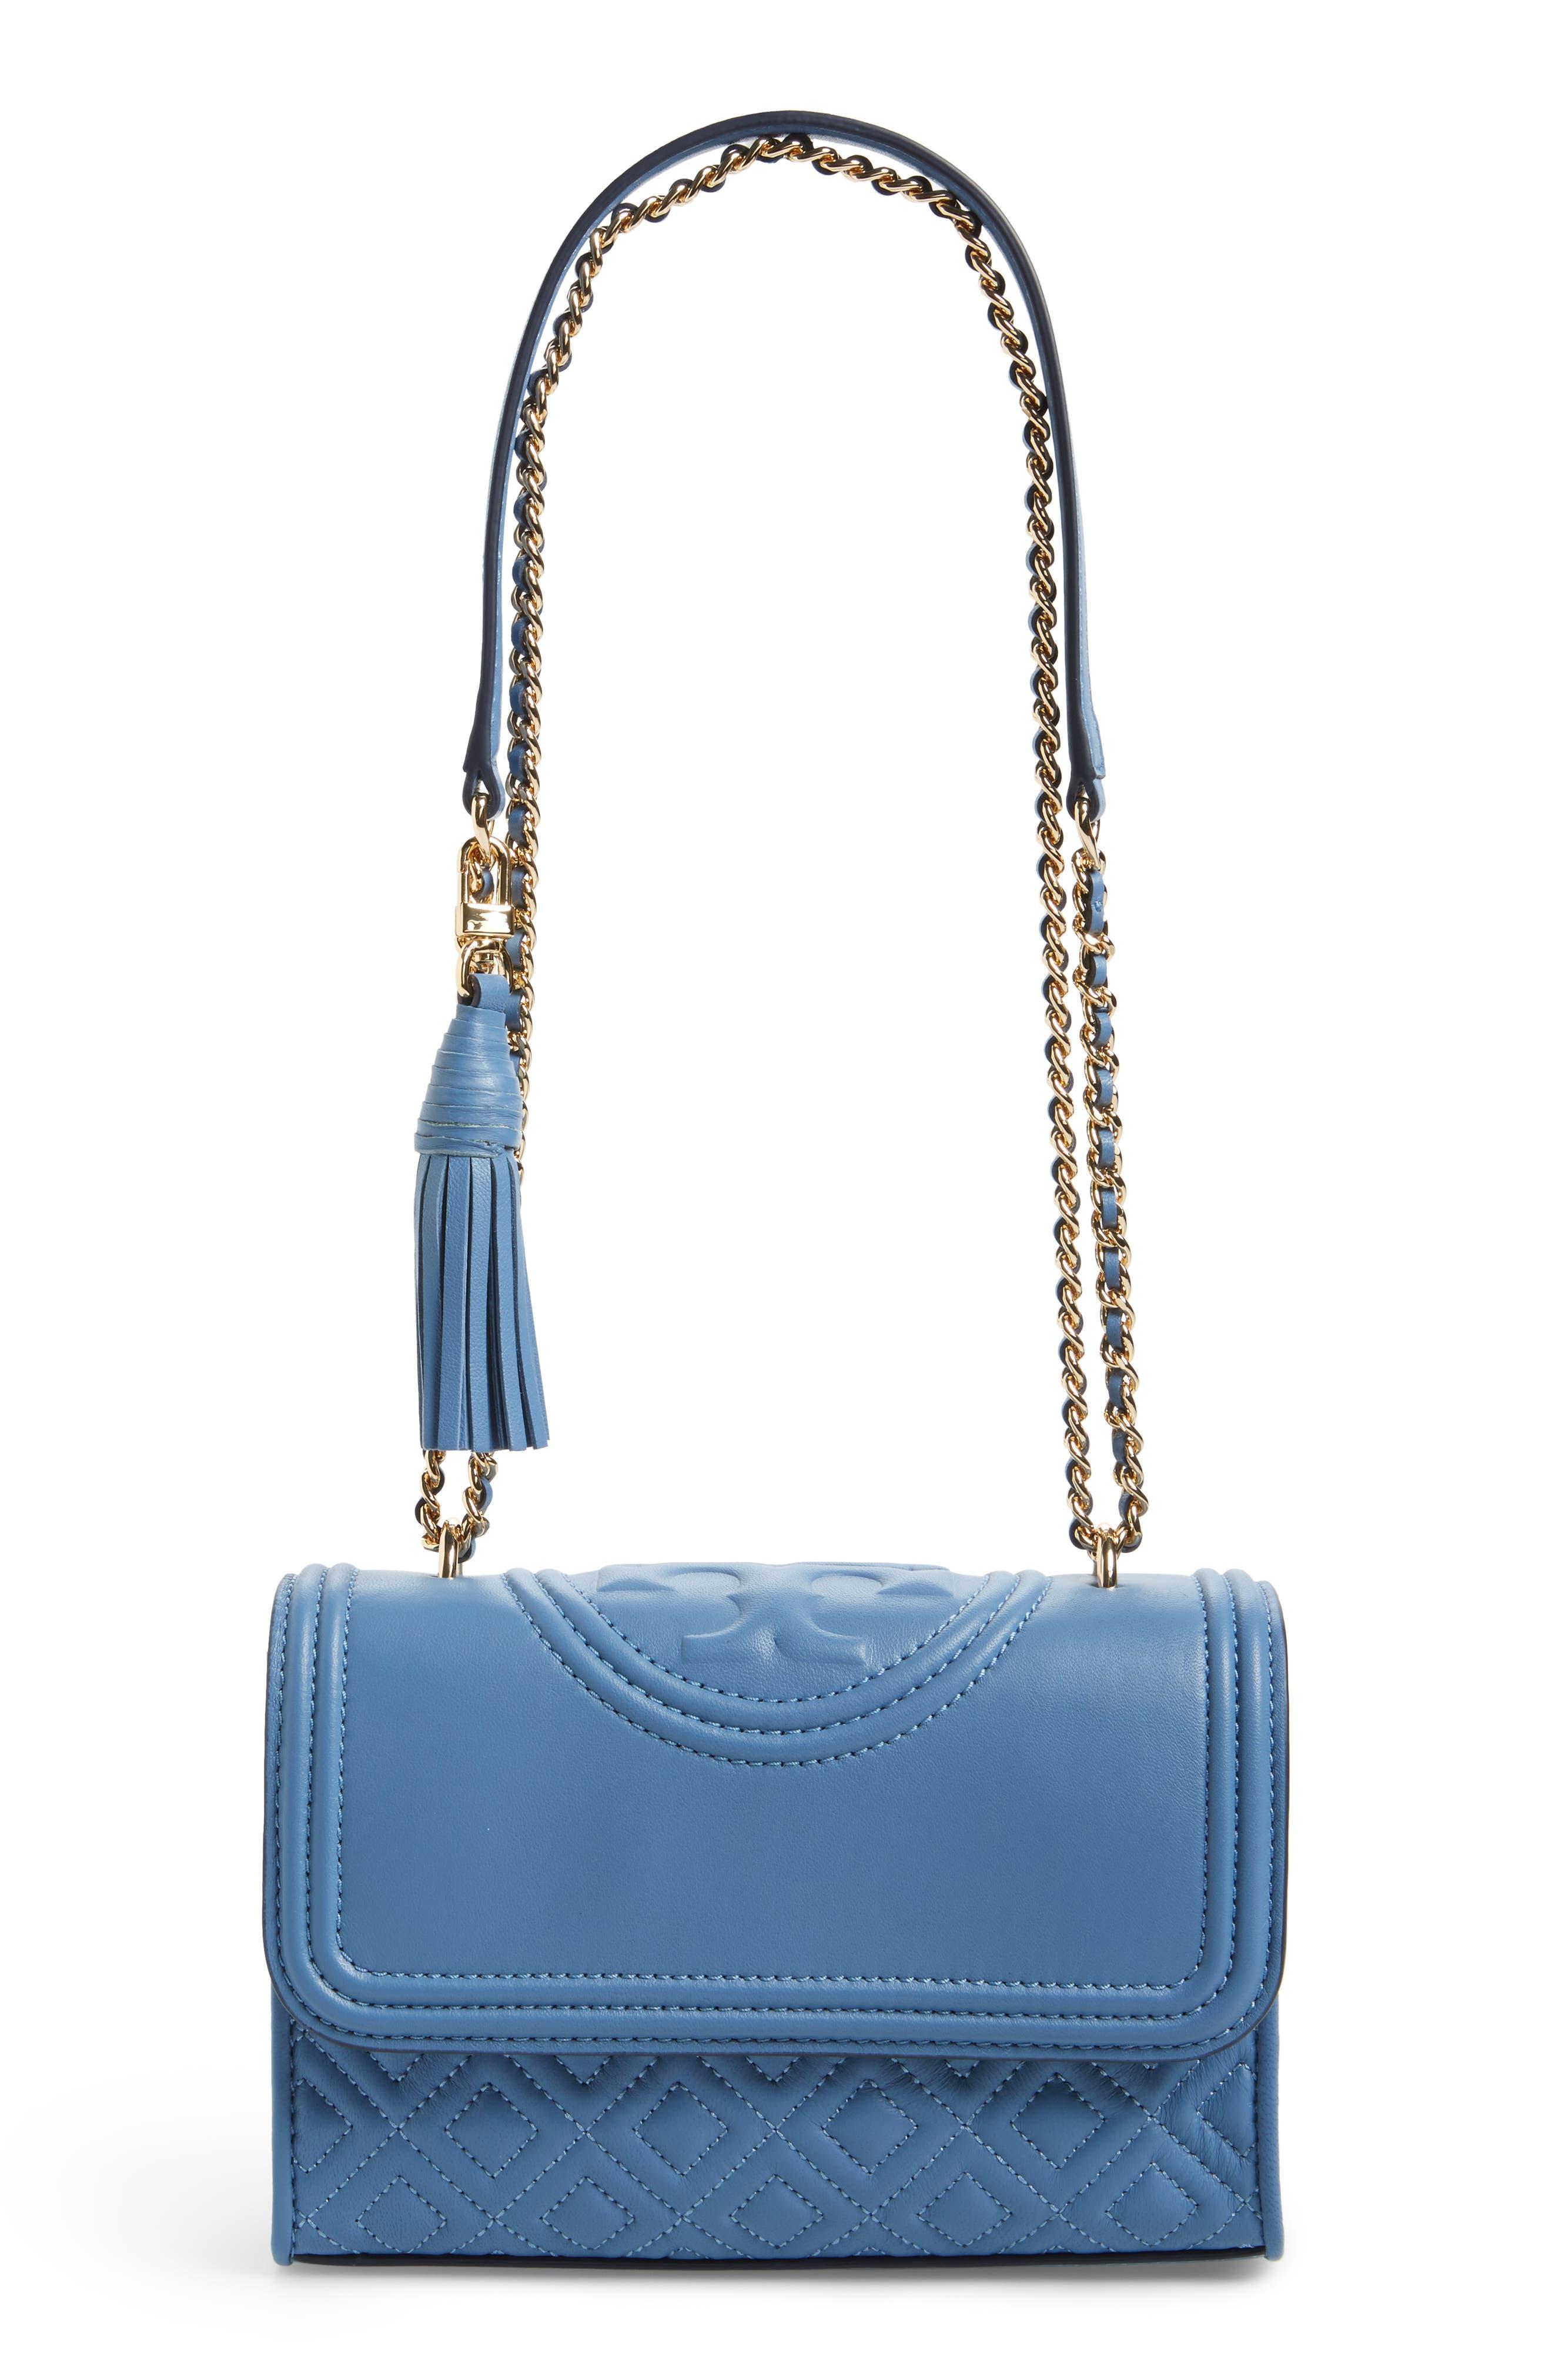 Main Image - Tory Burch Fleming Convertible Leather Shoulder Bag